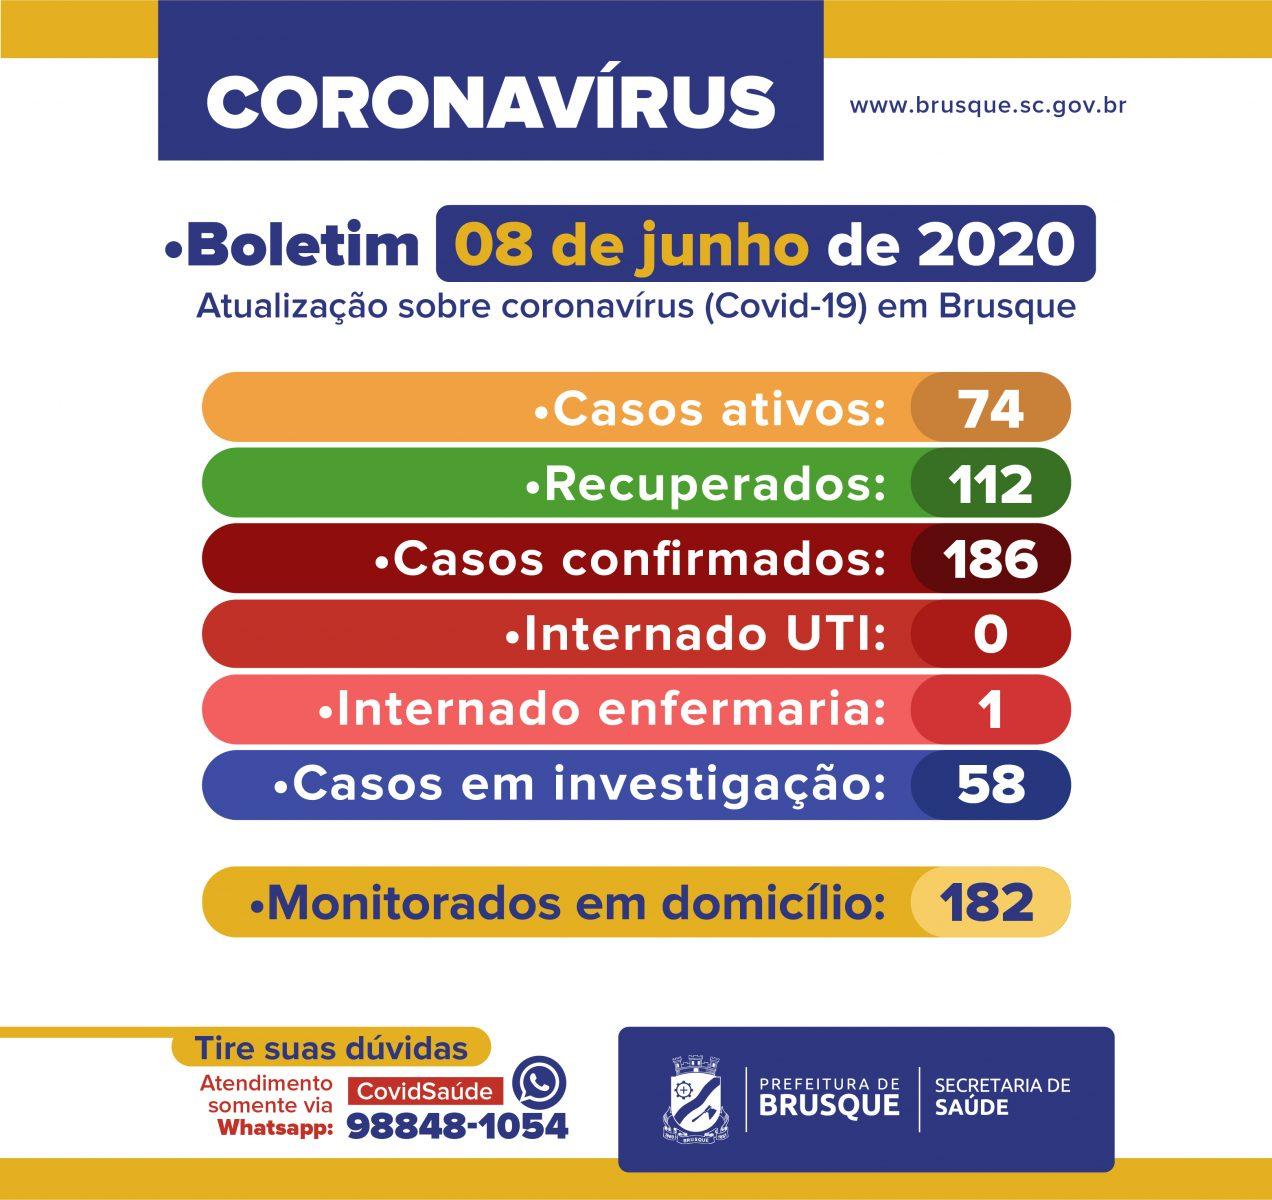 Confira o Boletim Epidemiológico da Prefeitura de Brusque desta segunda-feira (08)